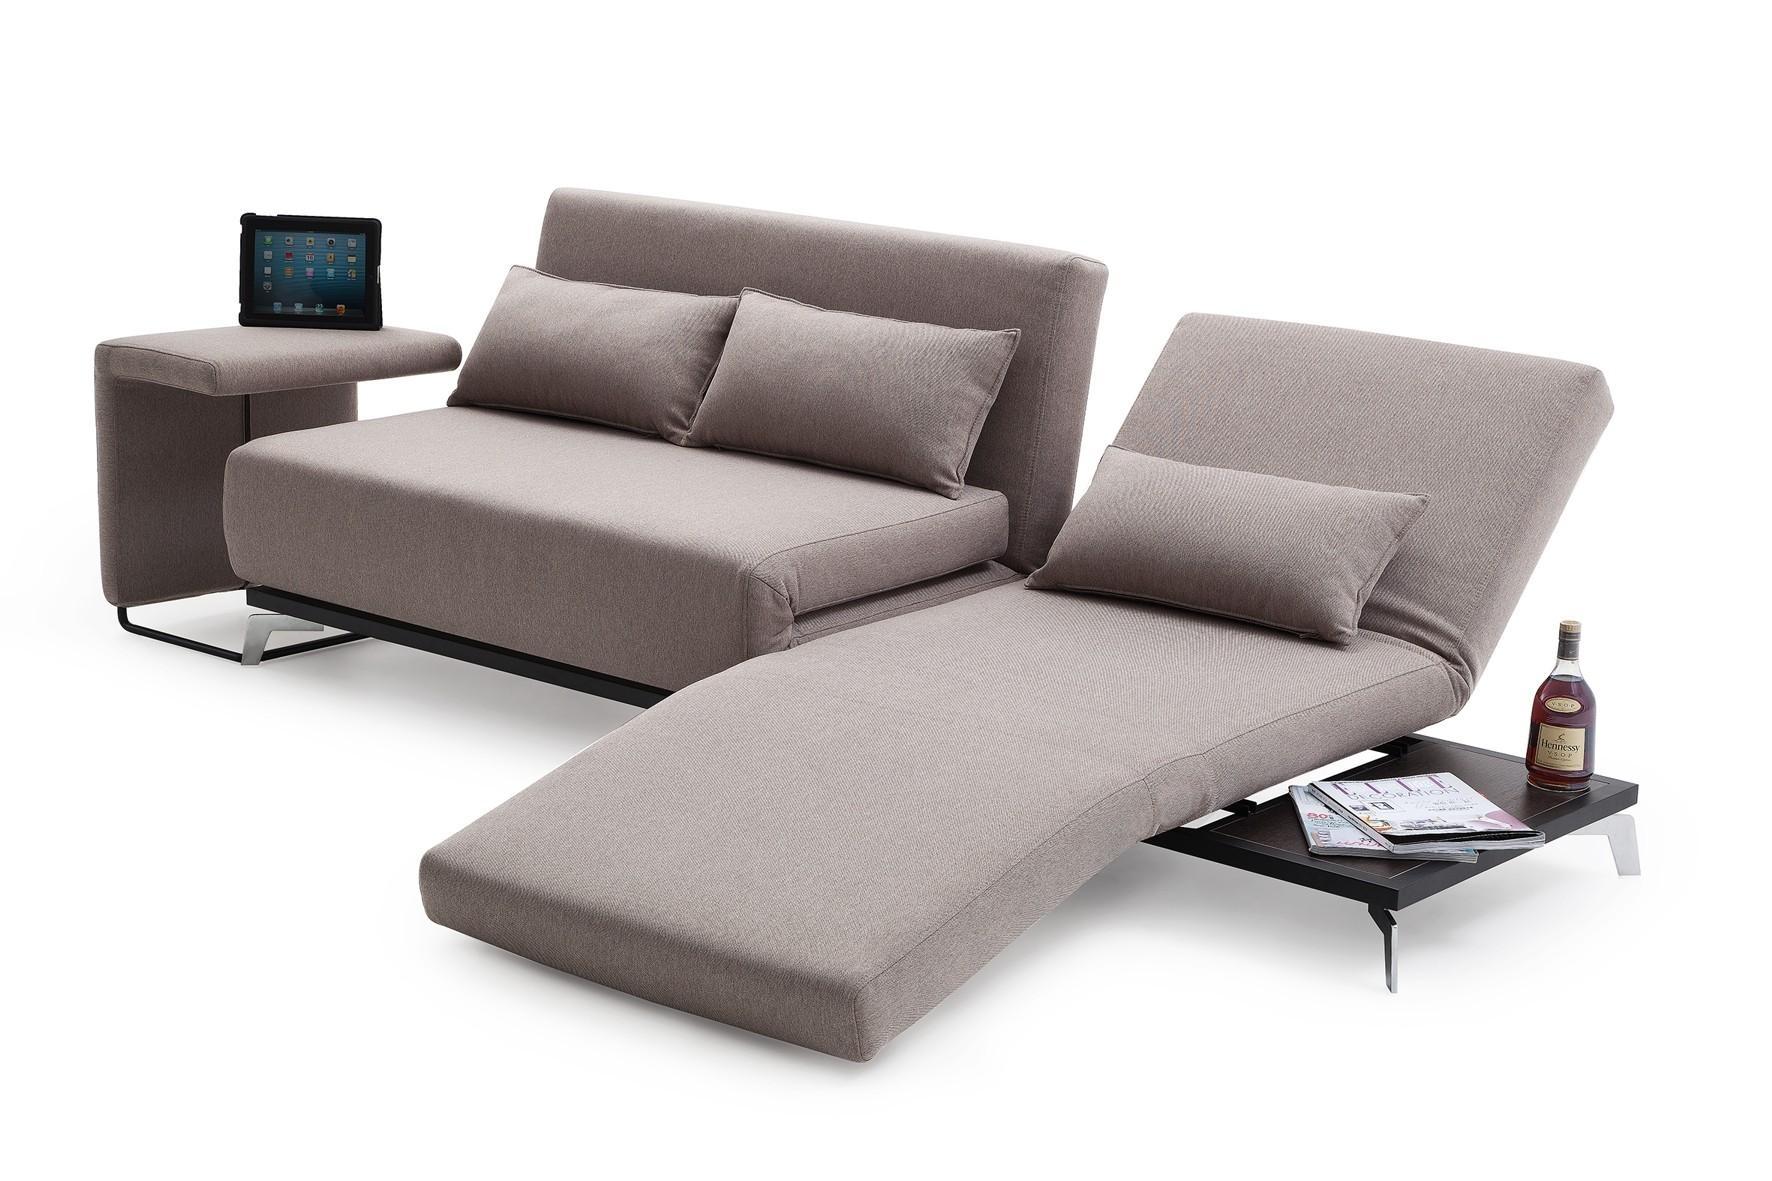 Jh033 Modern Sofa Bed in Modern Sofas